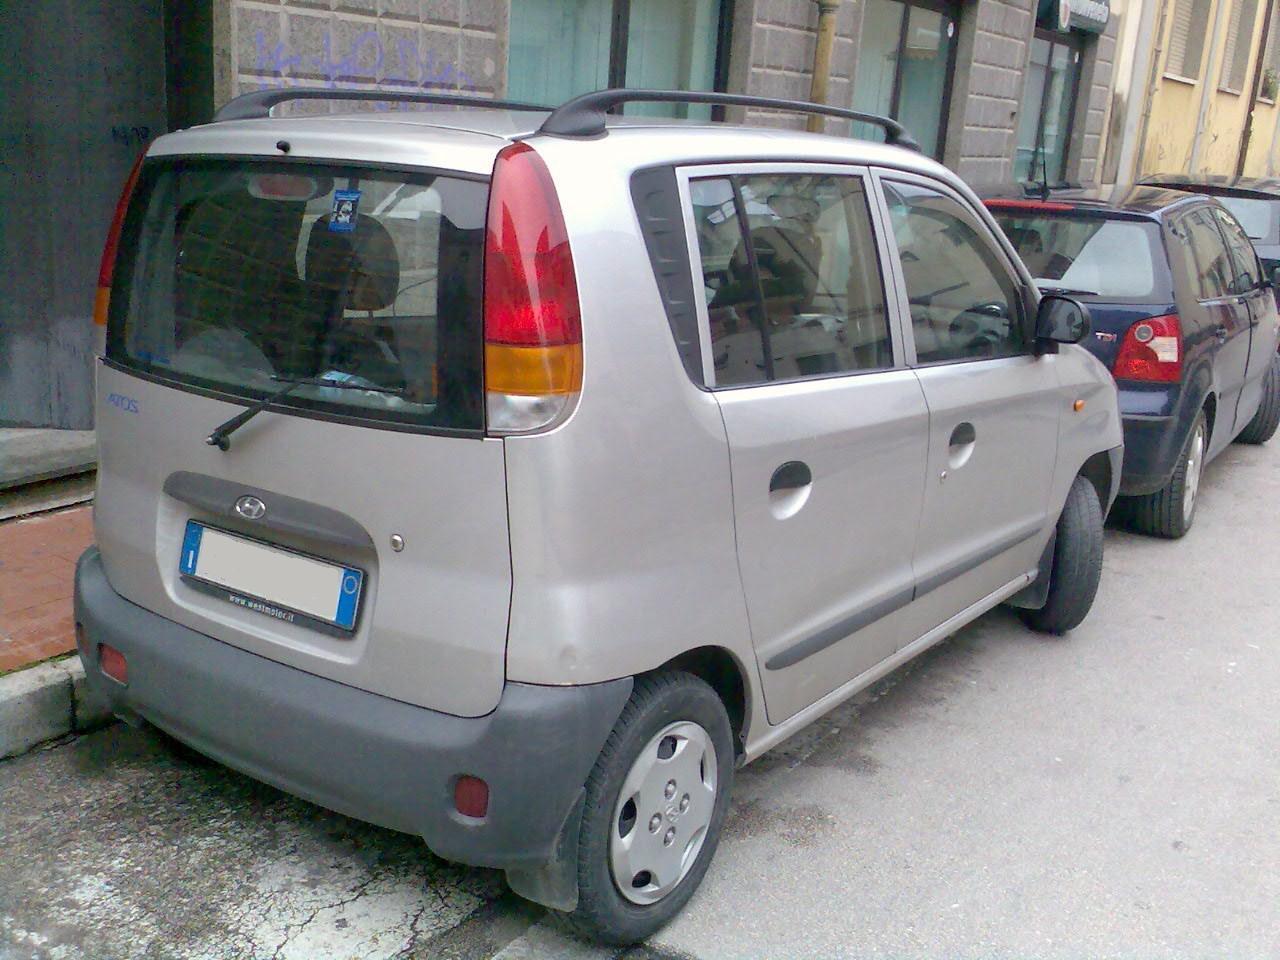 Hyundai Santro 2003 Exterior Rear View